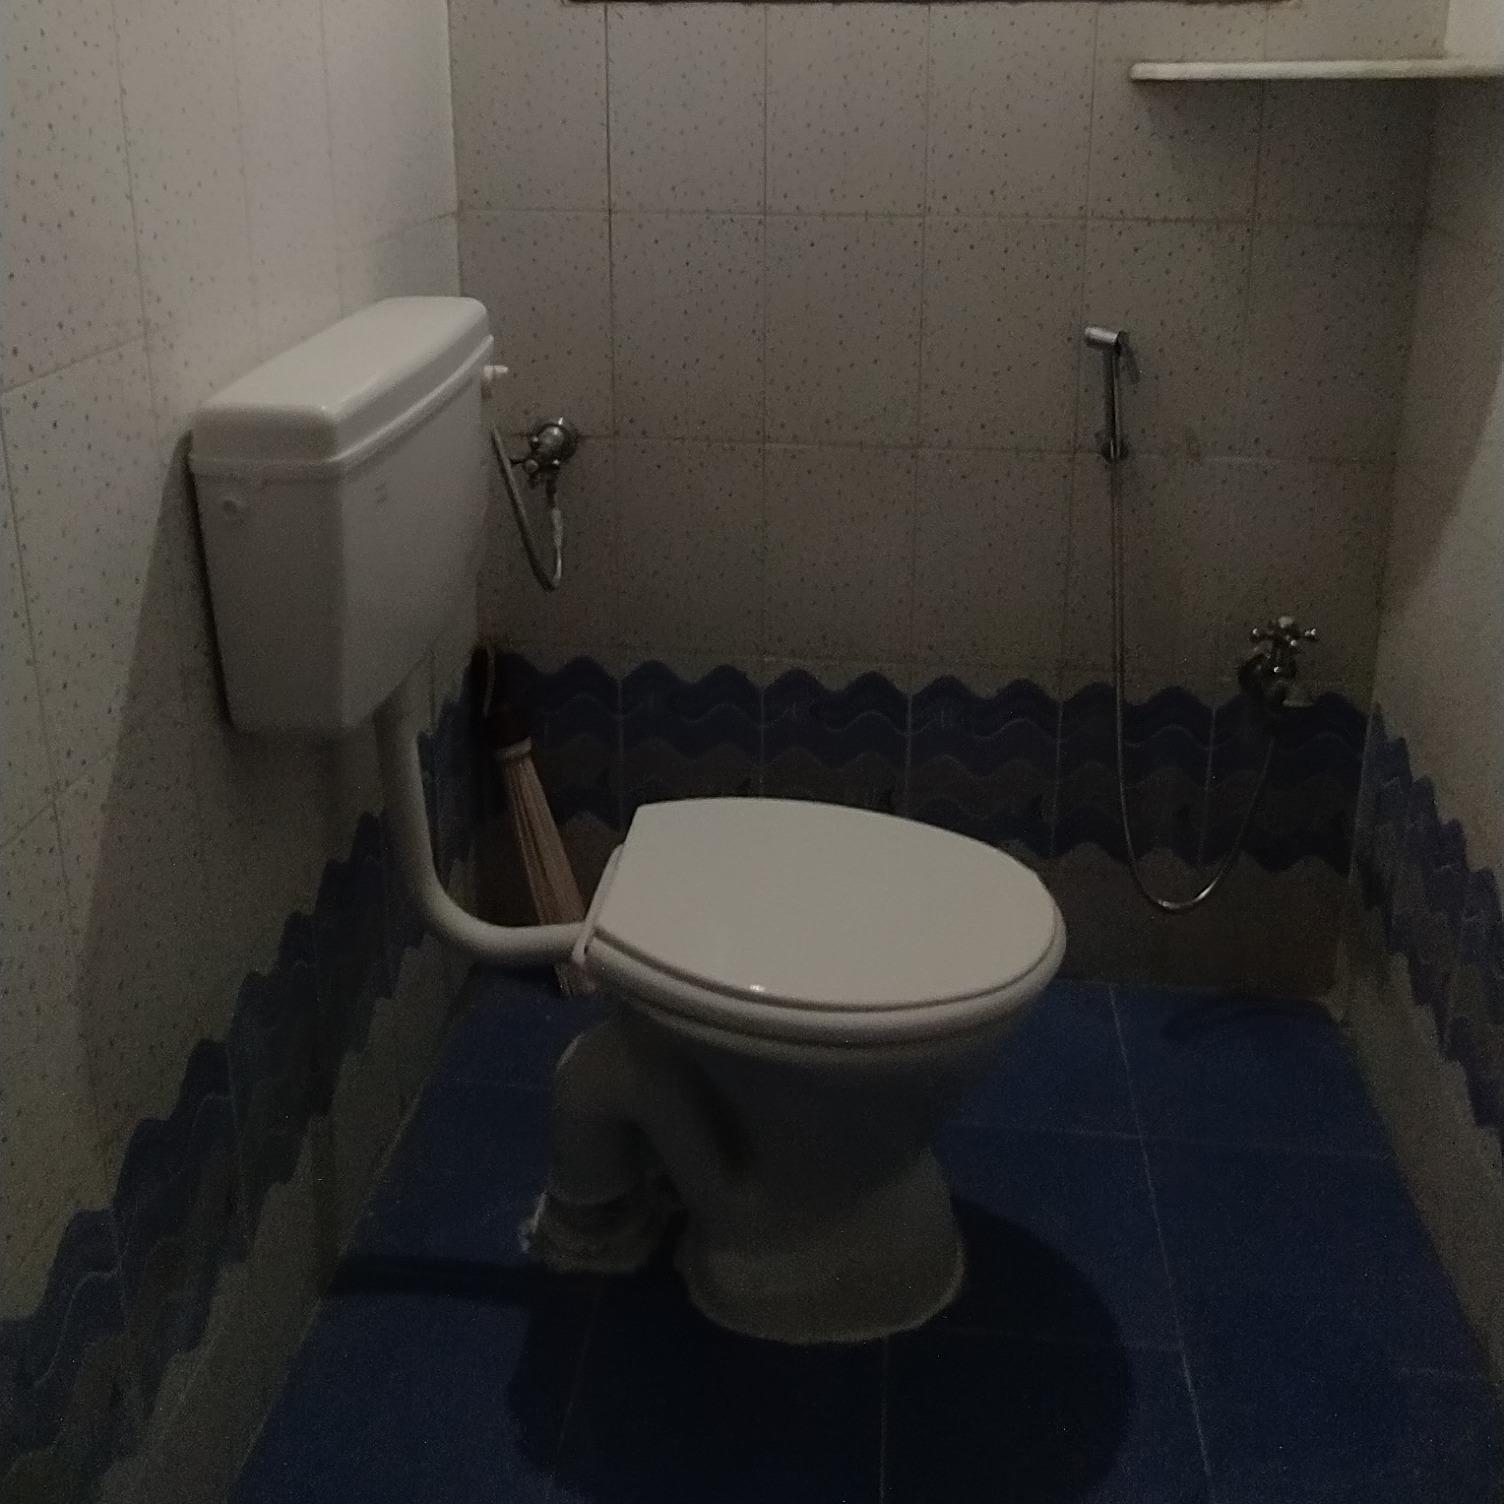 bathroom-Picture-sai-madhuri-enclave-ameerpet-2605846